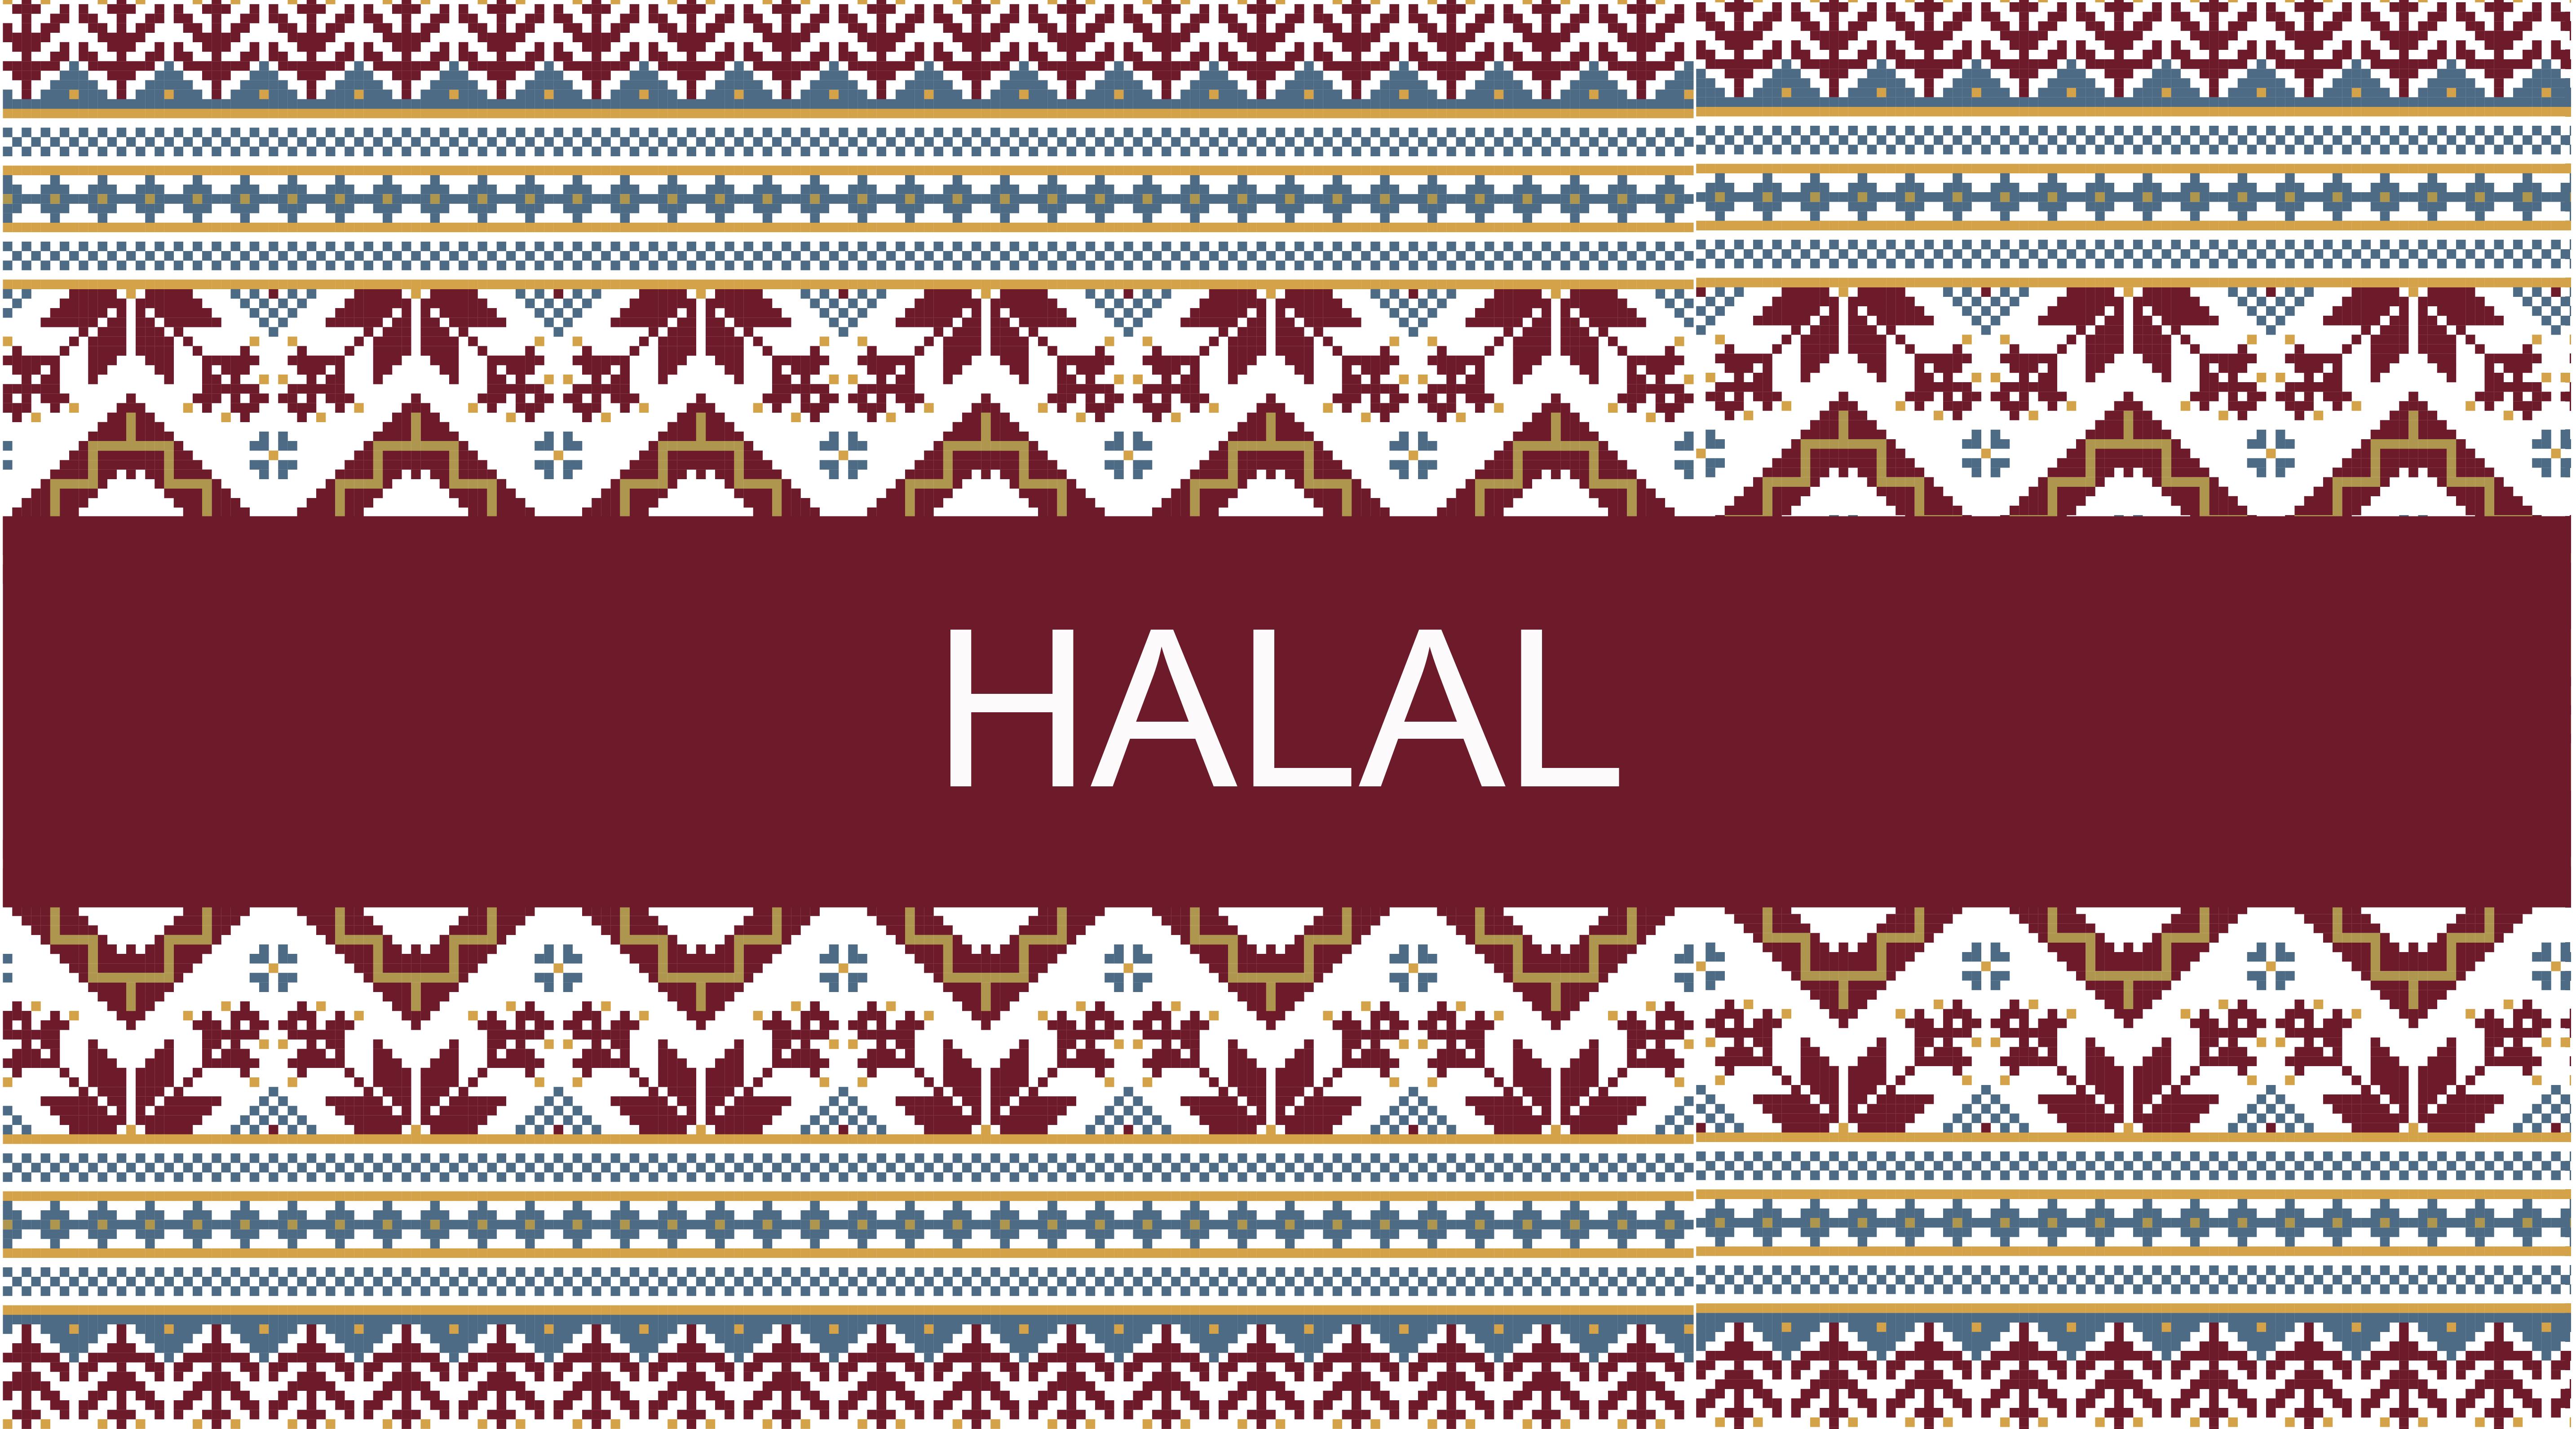 HALALRU